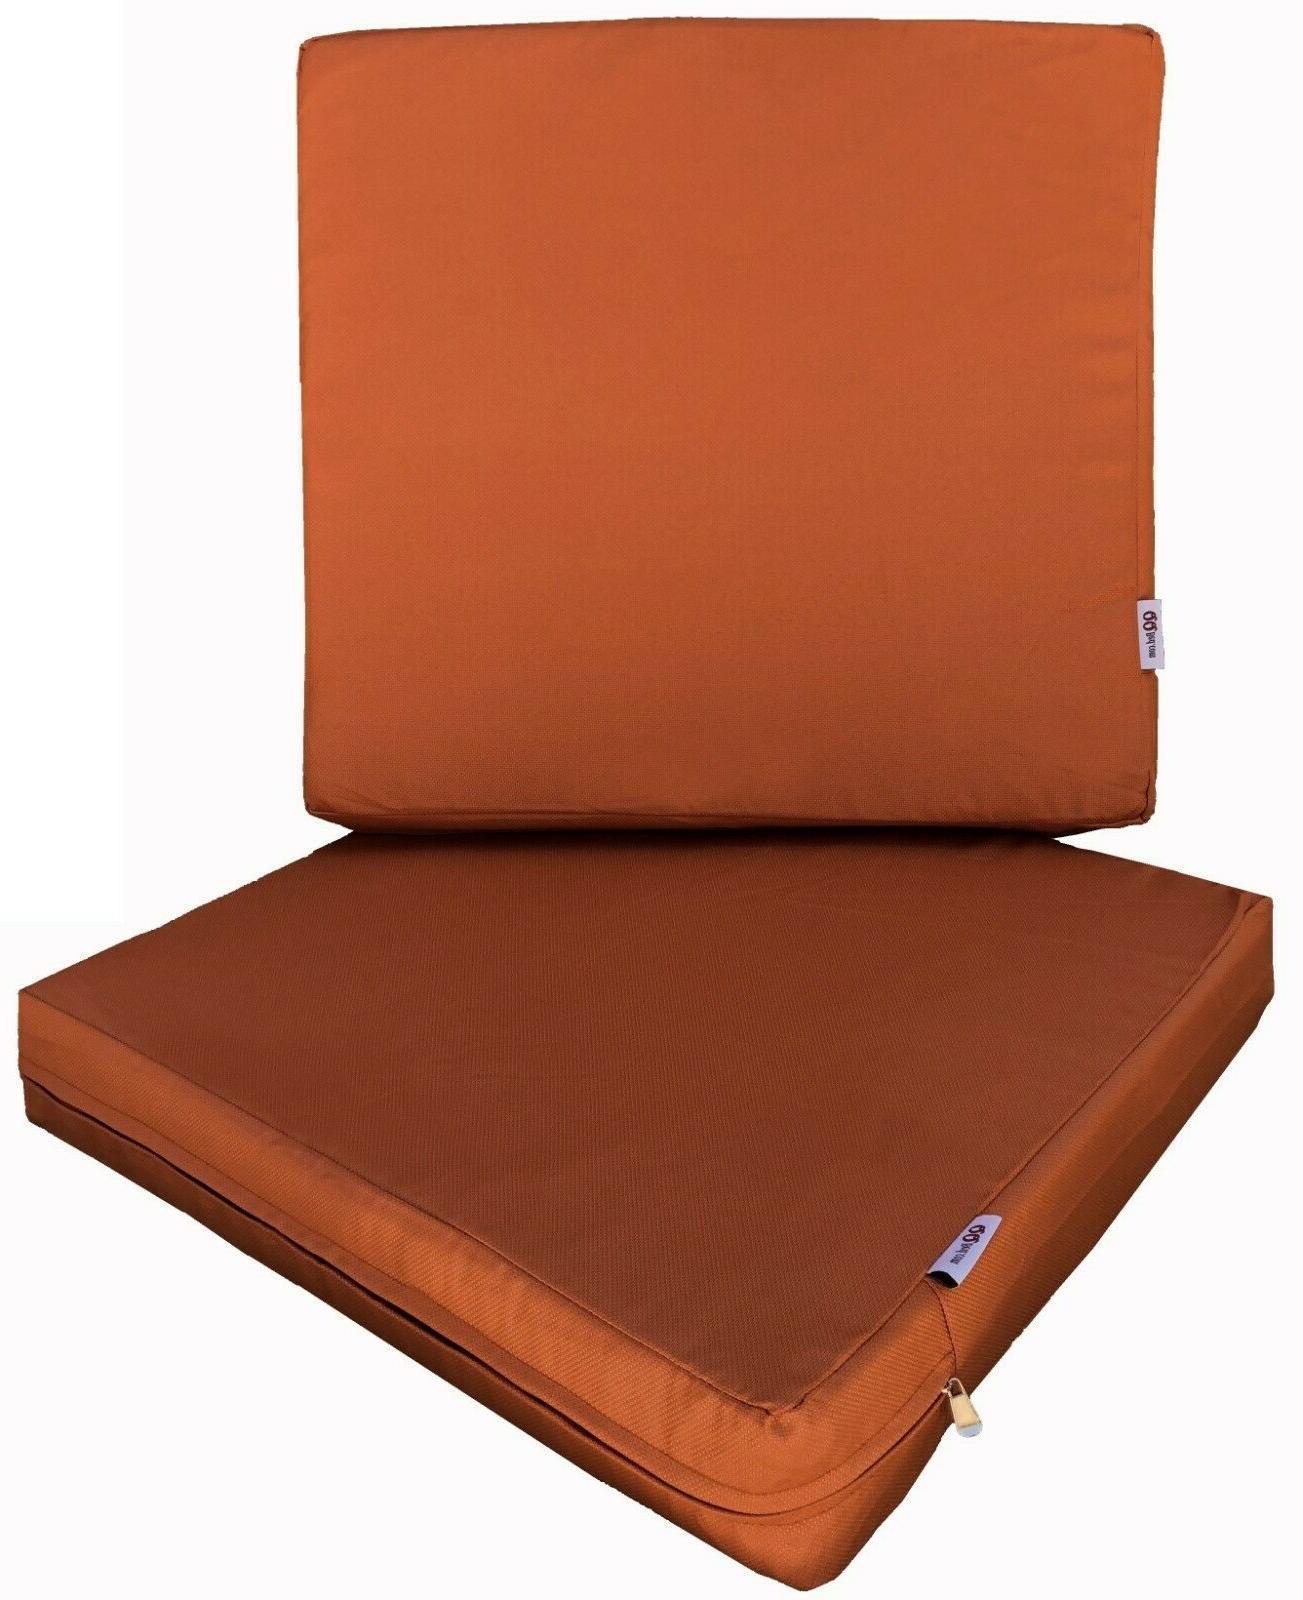 "Outdoor Seat Cushions Memory Foam 20""X18""X4"" Waterproof"